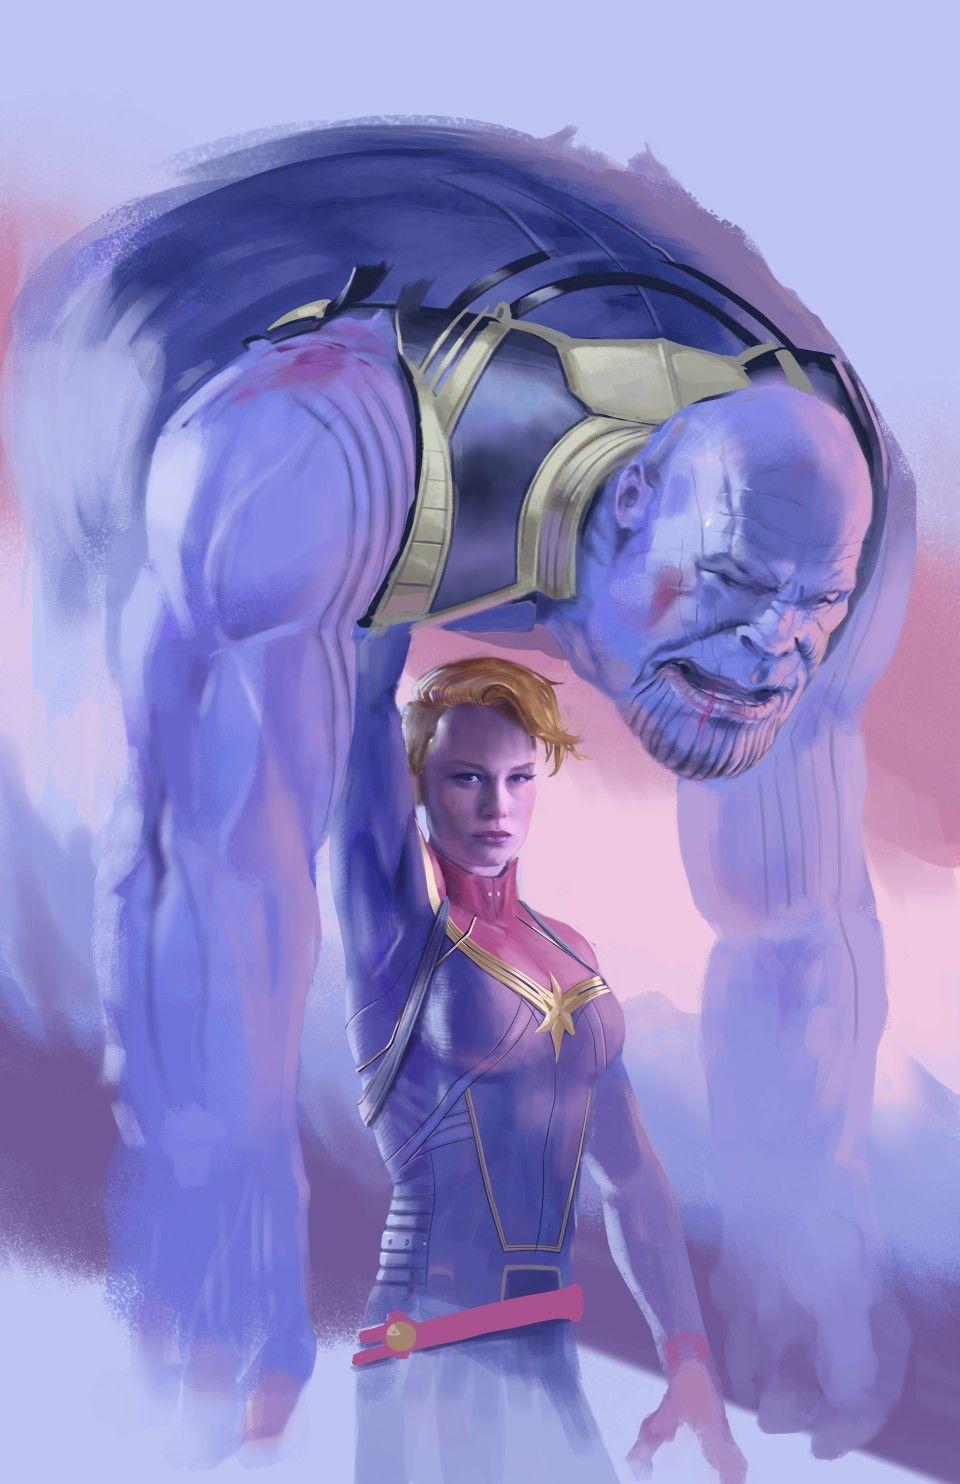 avengers 4 capatin marvel vs thanos capital marvel la mejor de